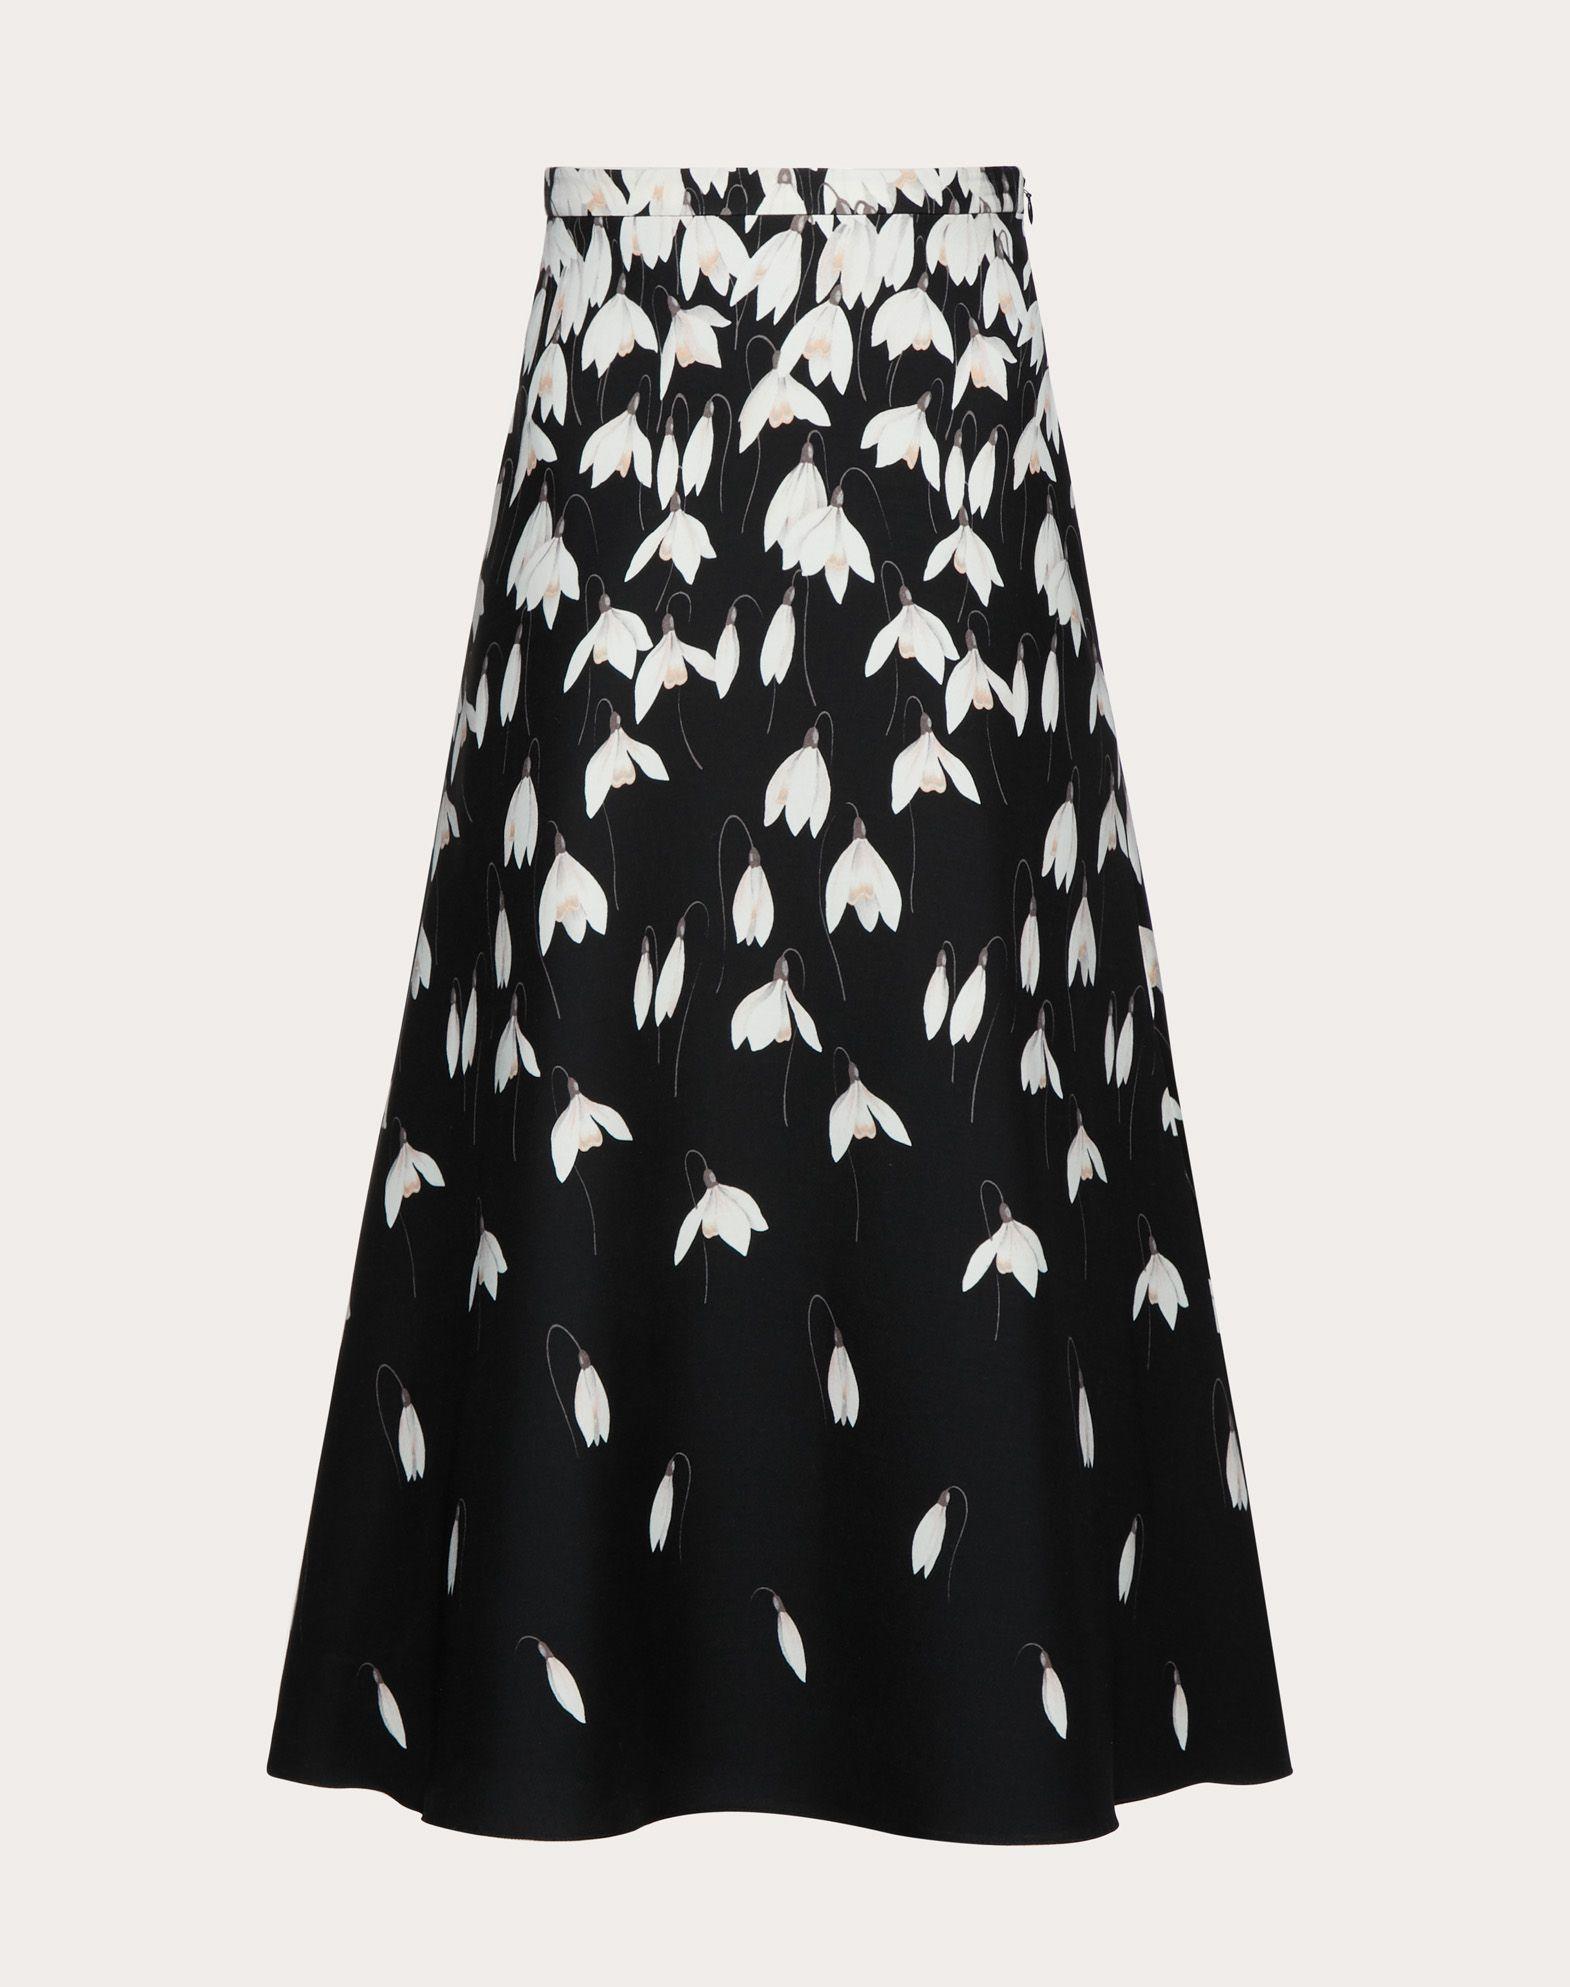 Crêpe Couture Snowdrop Skirt